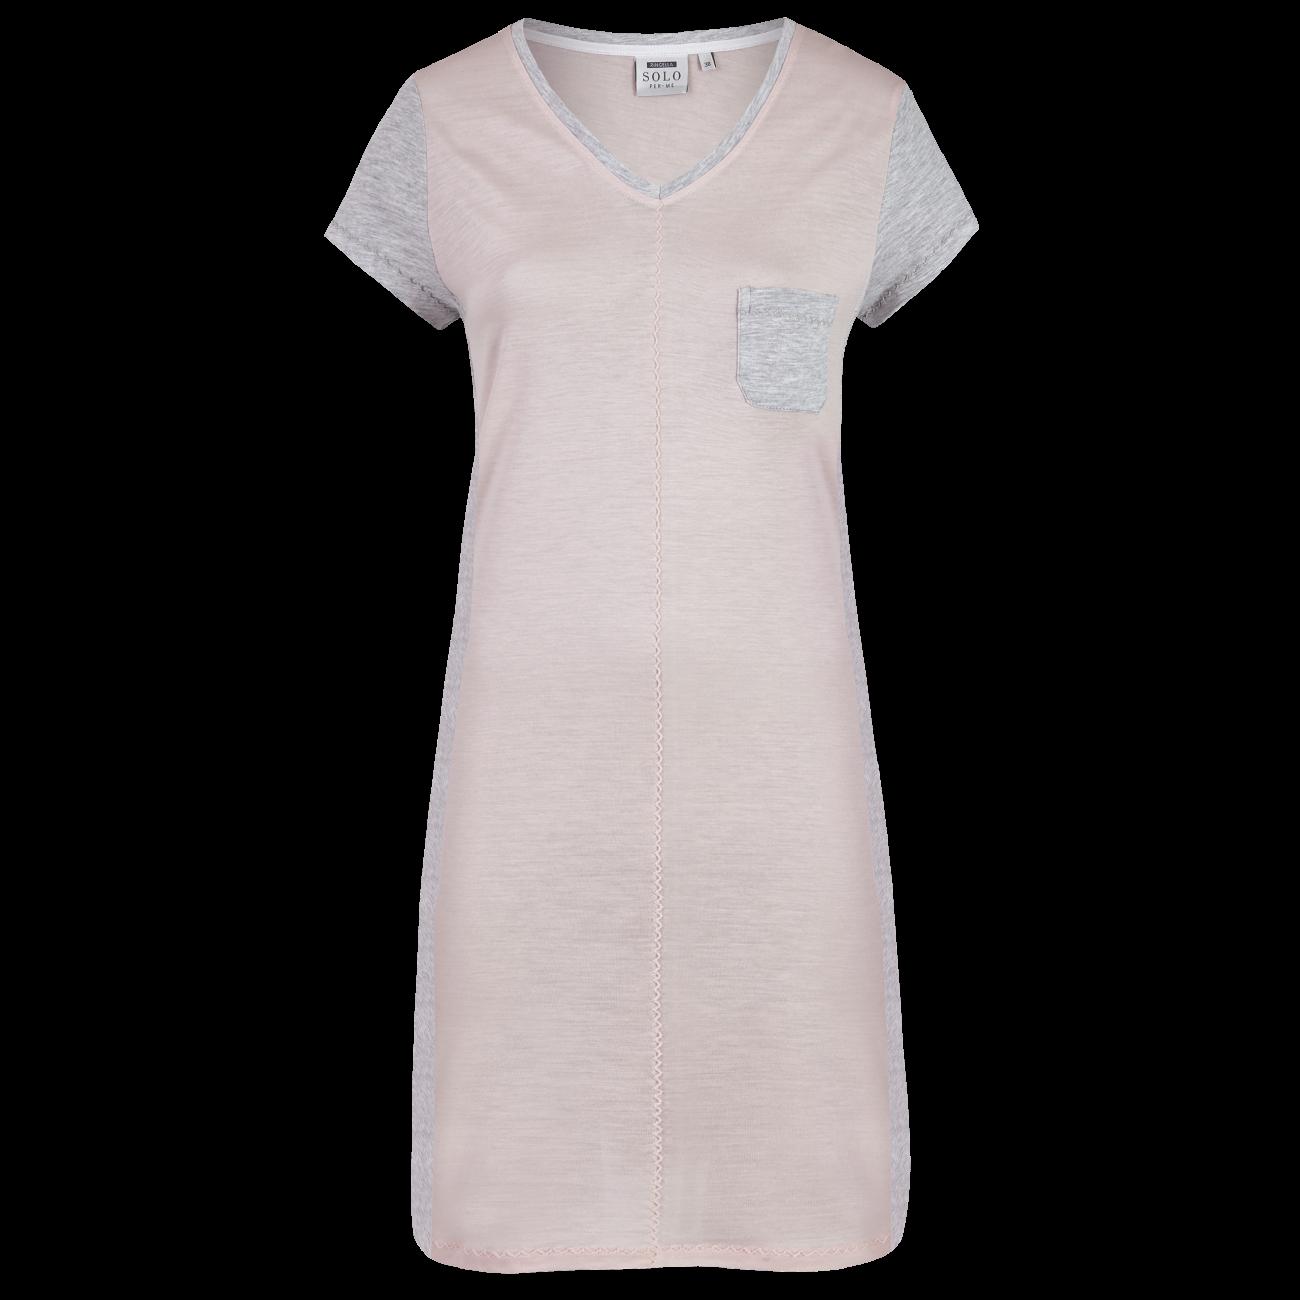 Nachthemd mit V-Ausschnitt rosa   40